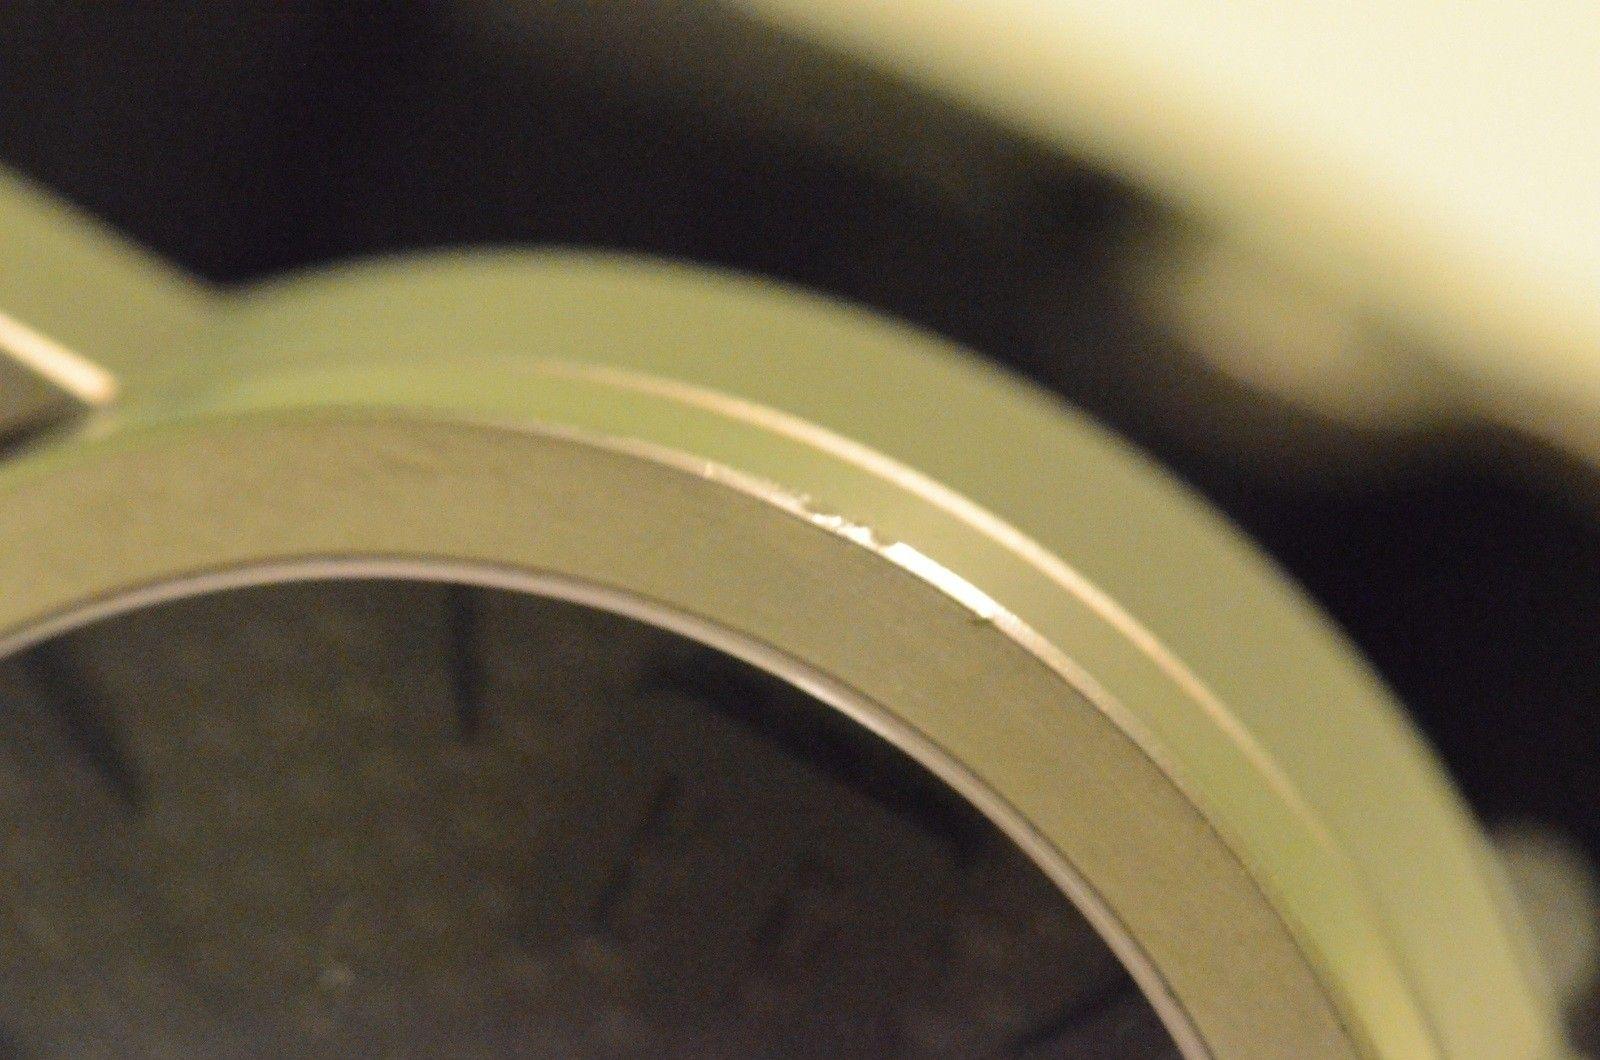 Gearbox Brushed Titanium- Carbon Fiber Dial SOLD! - DSC_0446.JPG